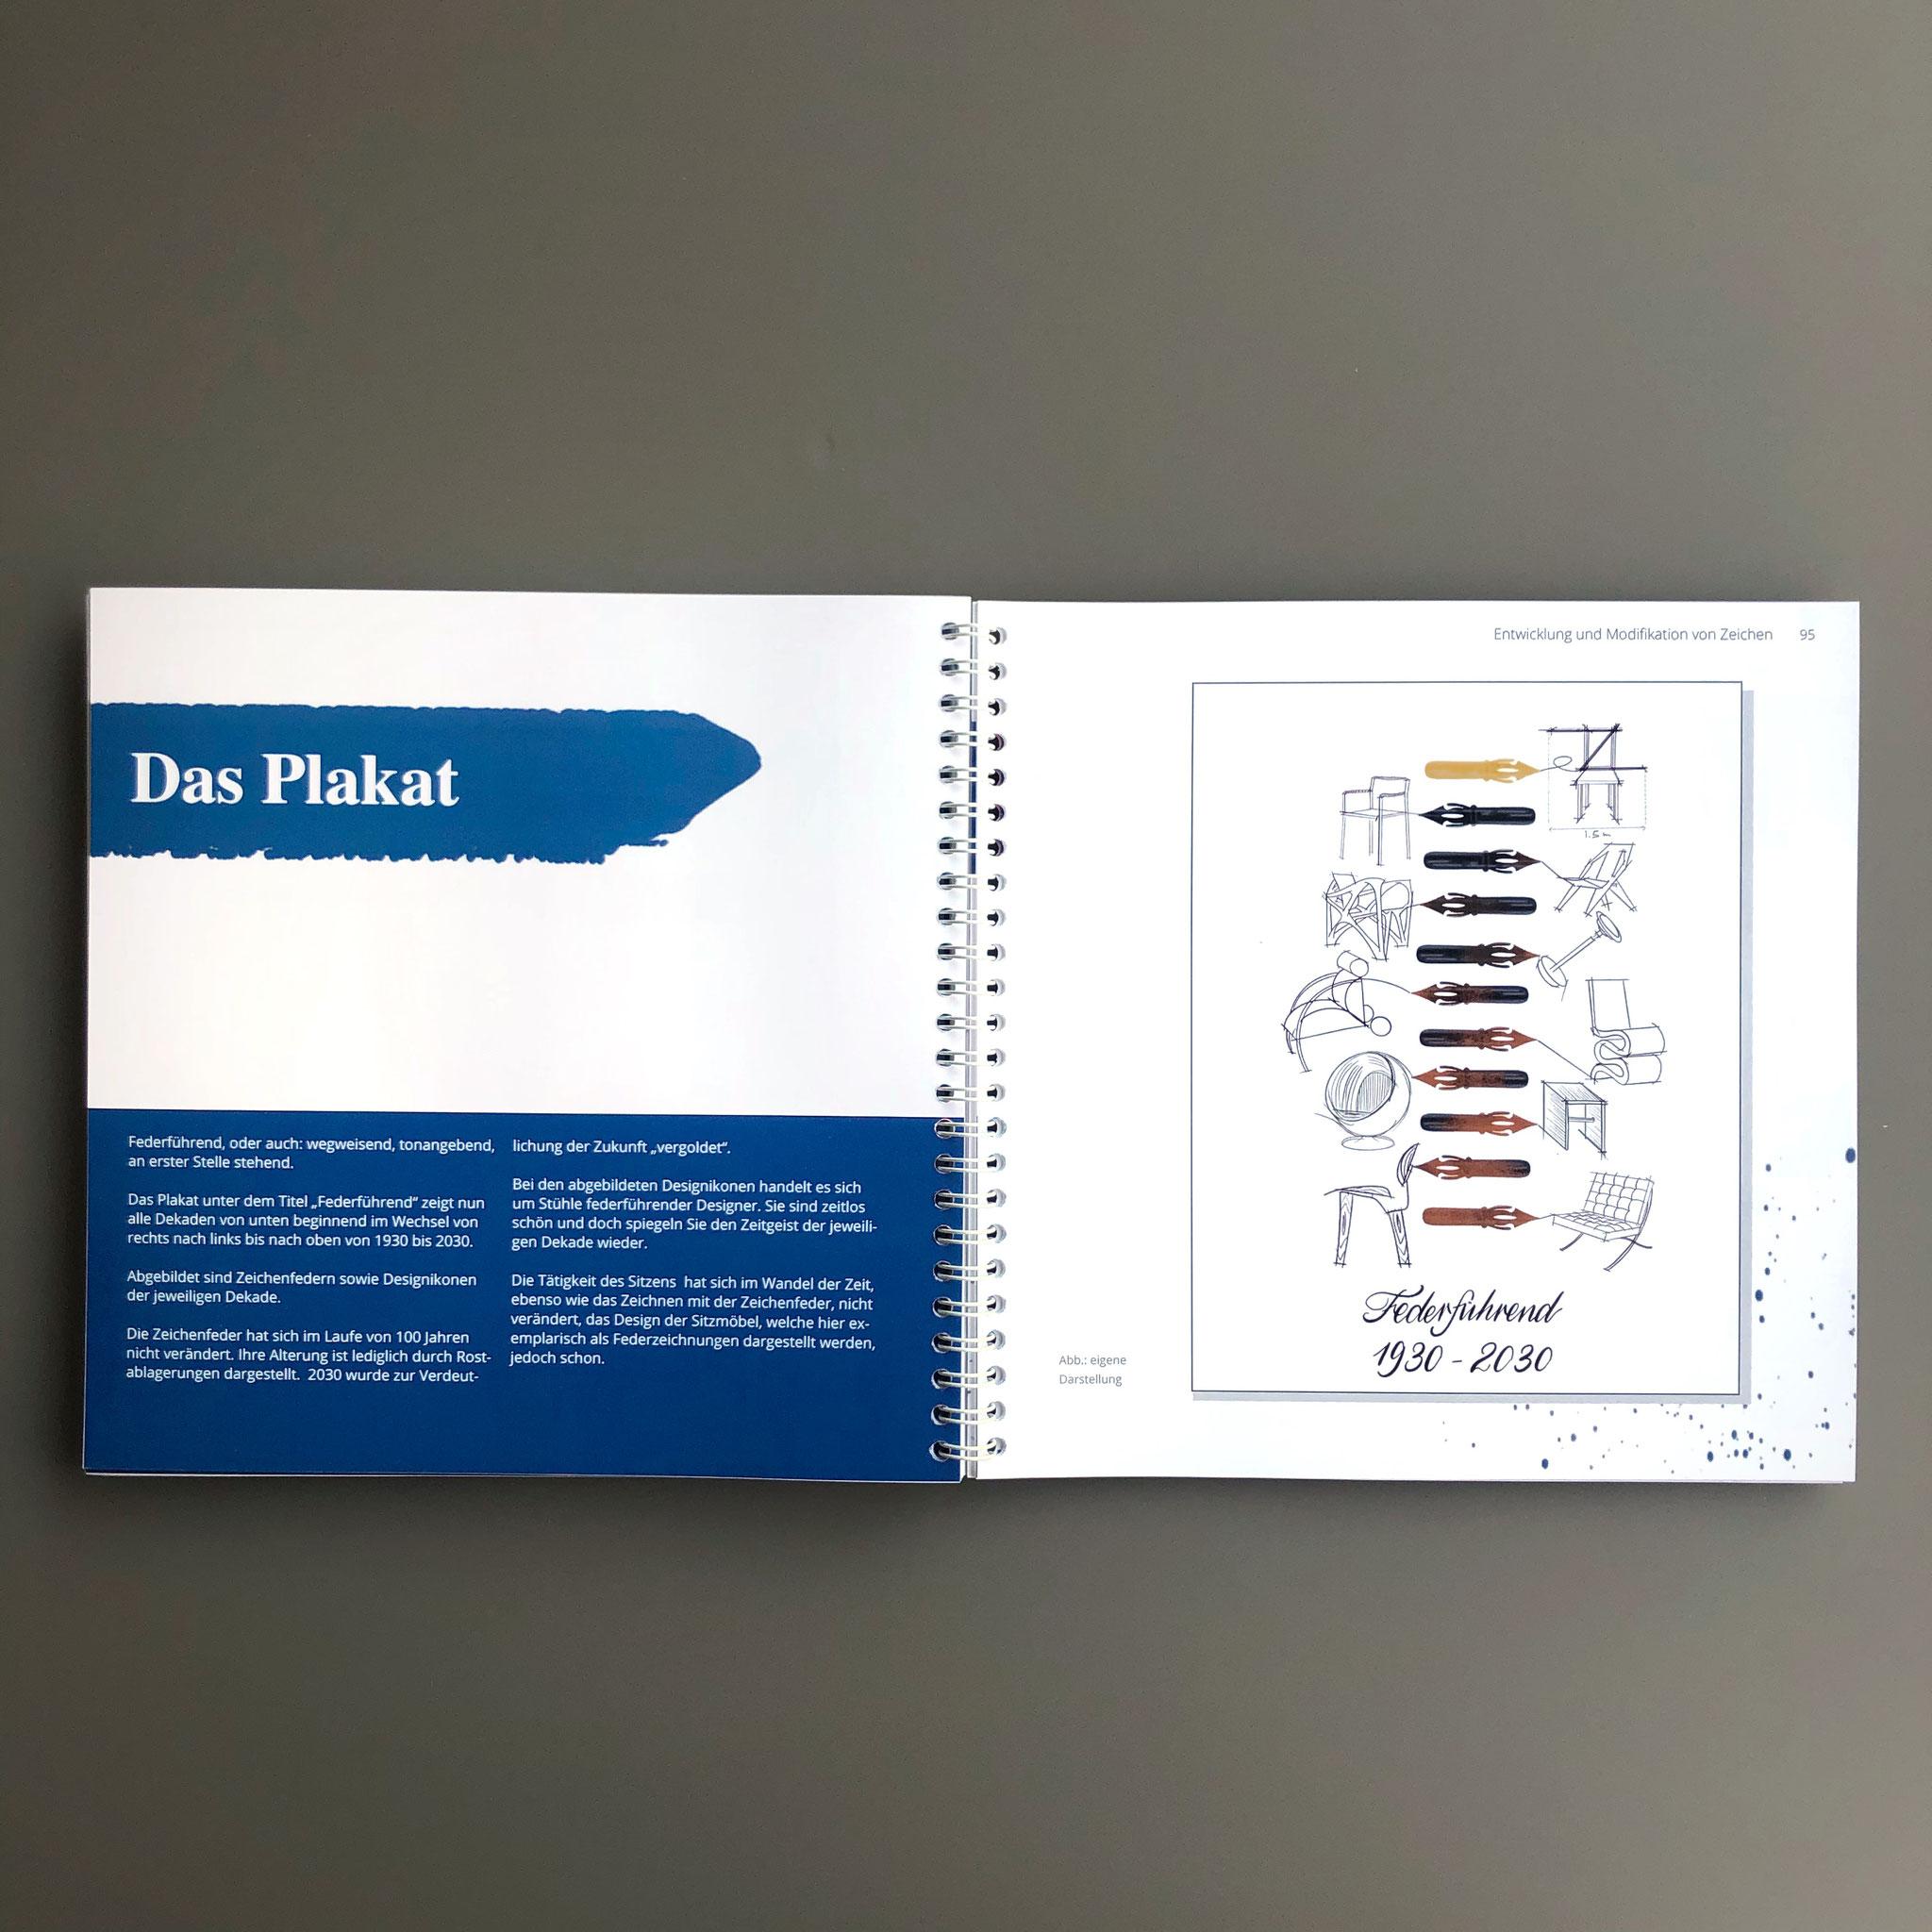 DIPLOMA Semester Dokumentation, Modul Semantik /  1. Semester